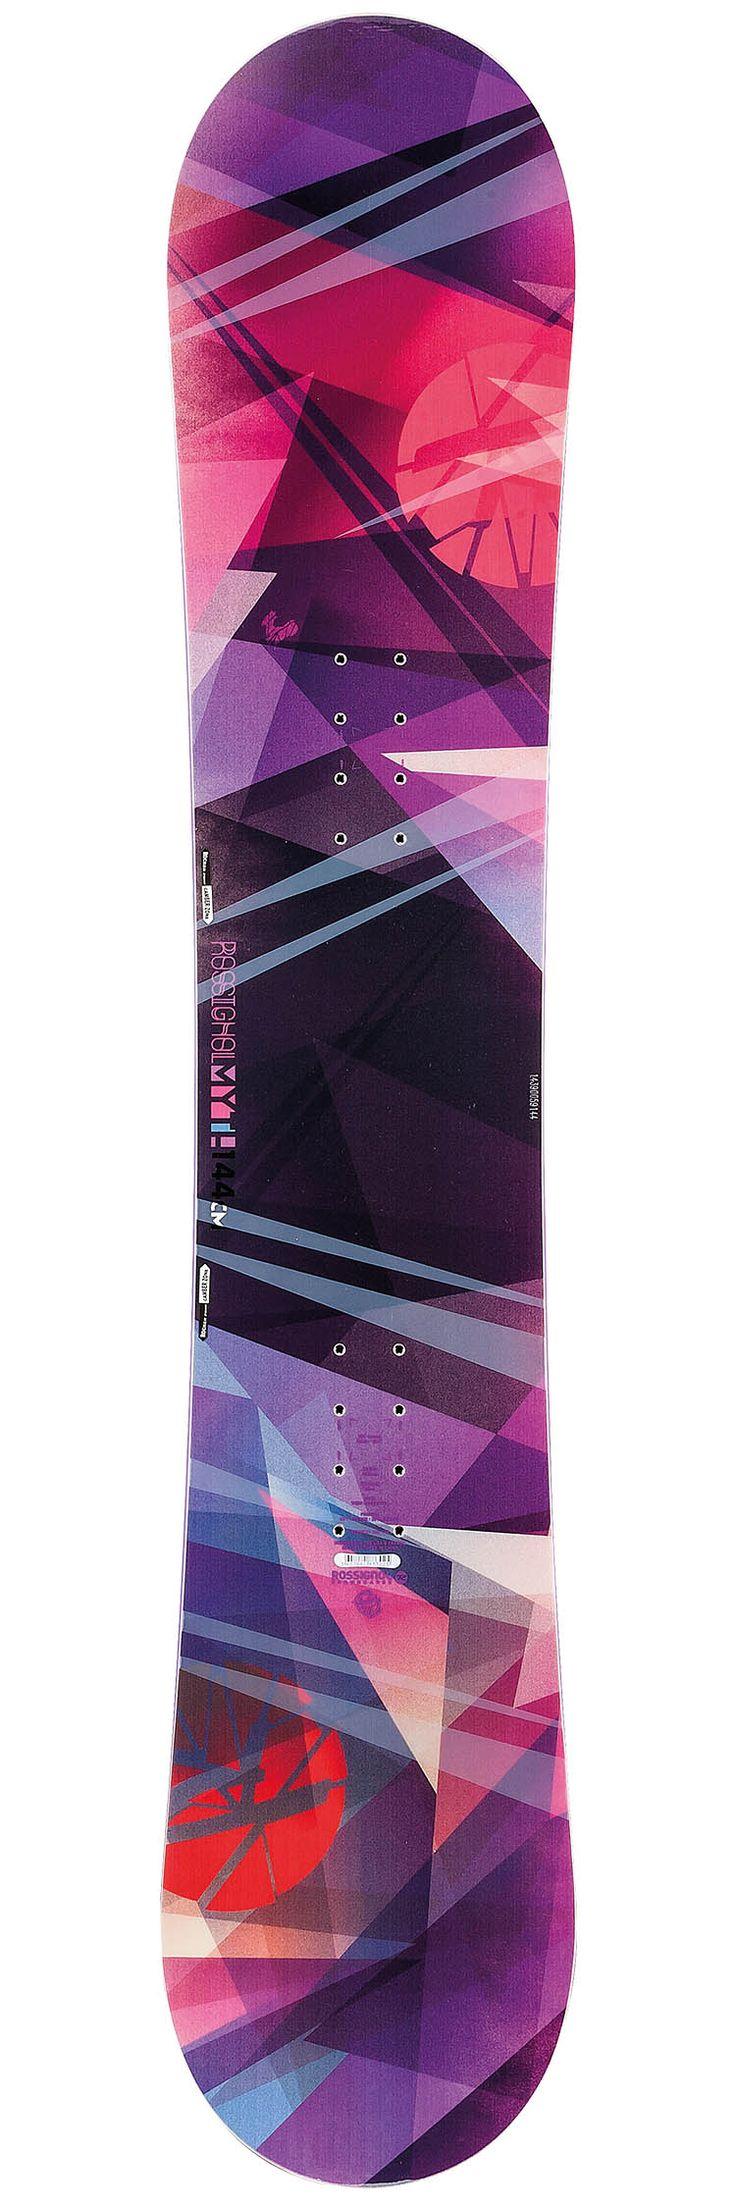 #Rossignol Myth : achat snowboard femme women chez Glisshop.com